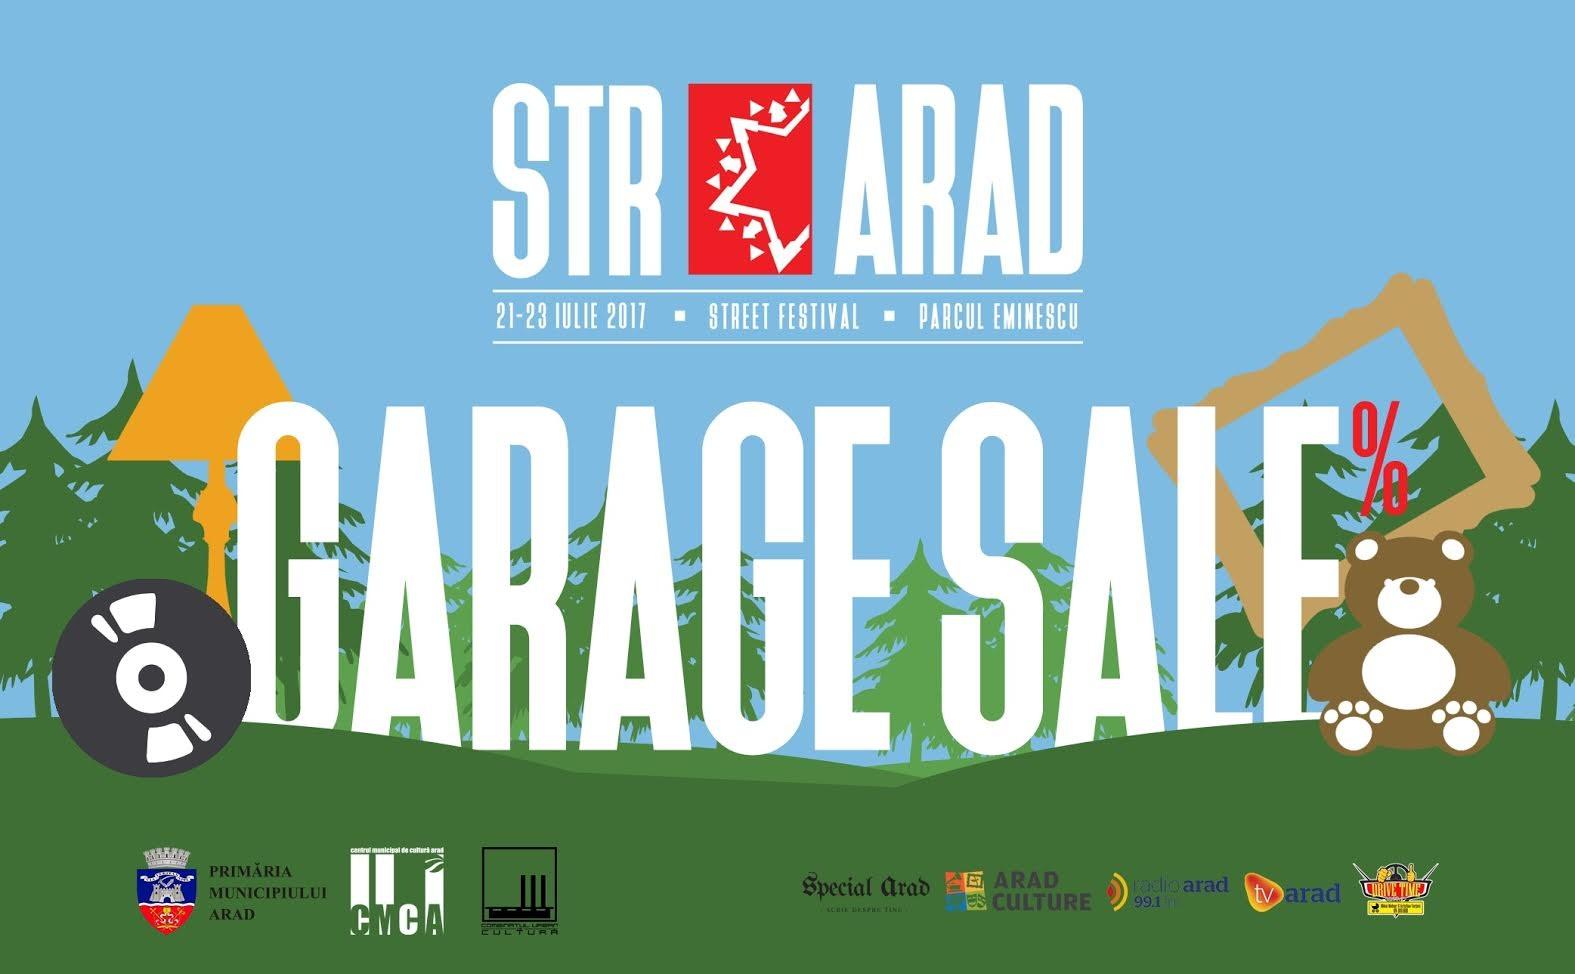 Garage Sale la STRARAD 21-23 iulie 2017